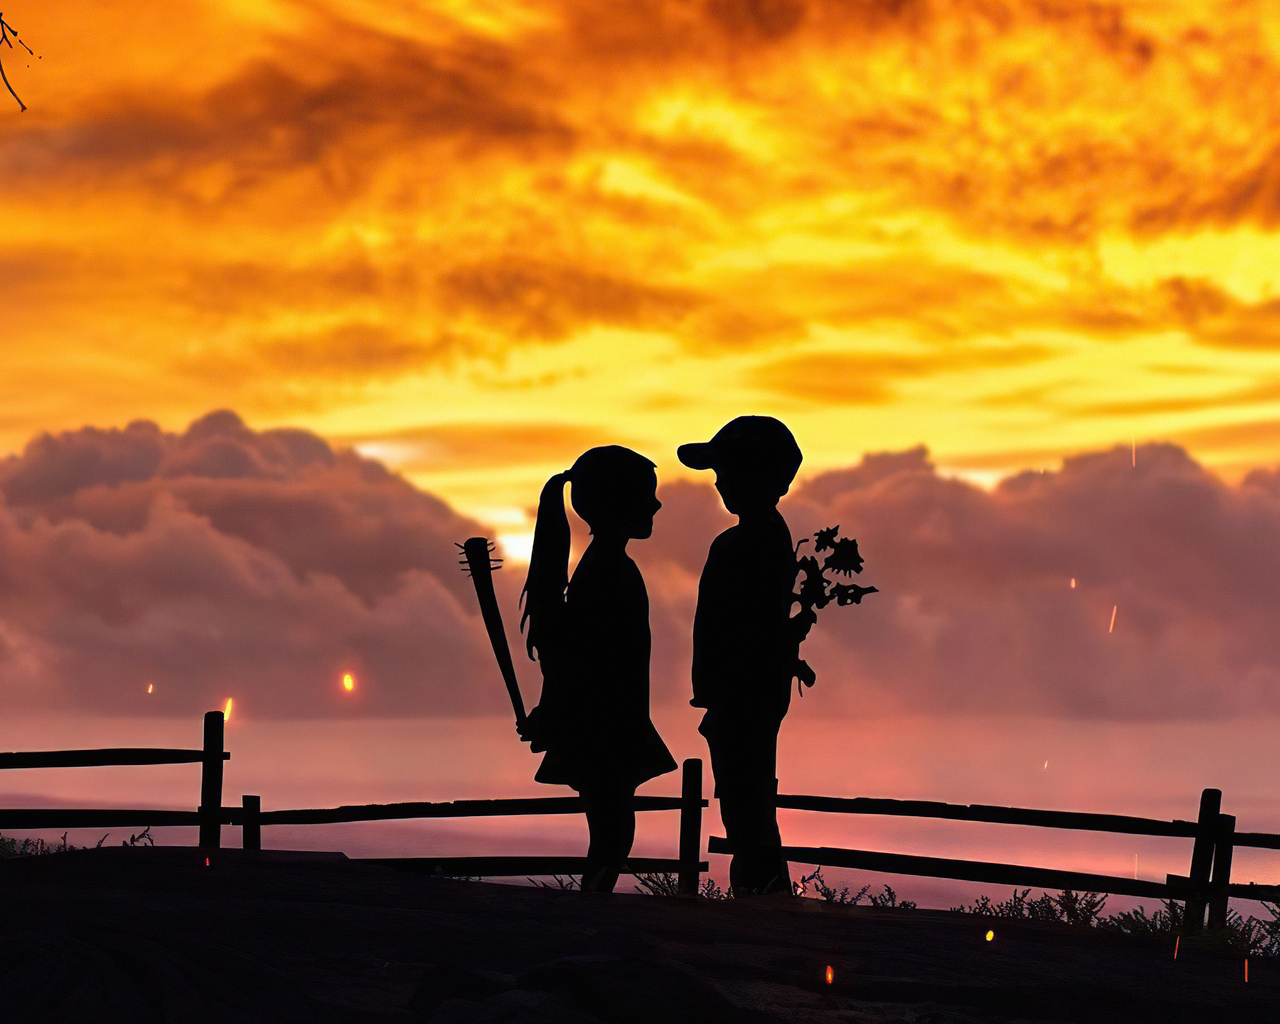 childhood-broken-love-4k-jf.jpg